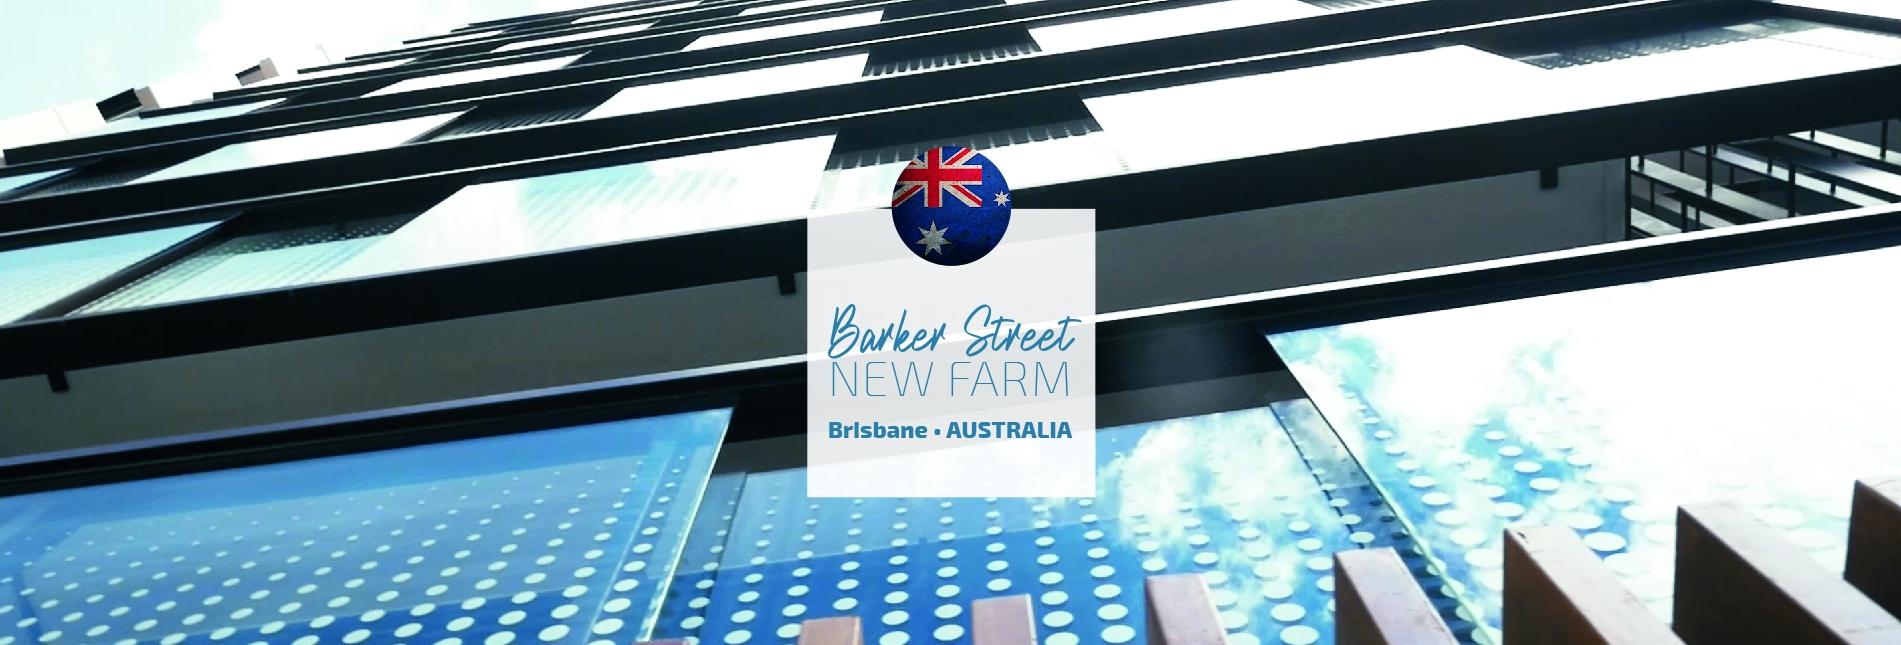 BarkerSt, New farm, Brisbane, Qld Australie